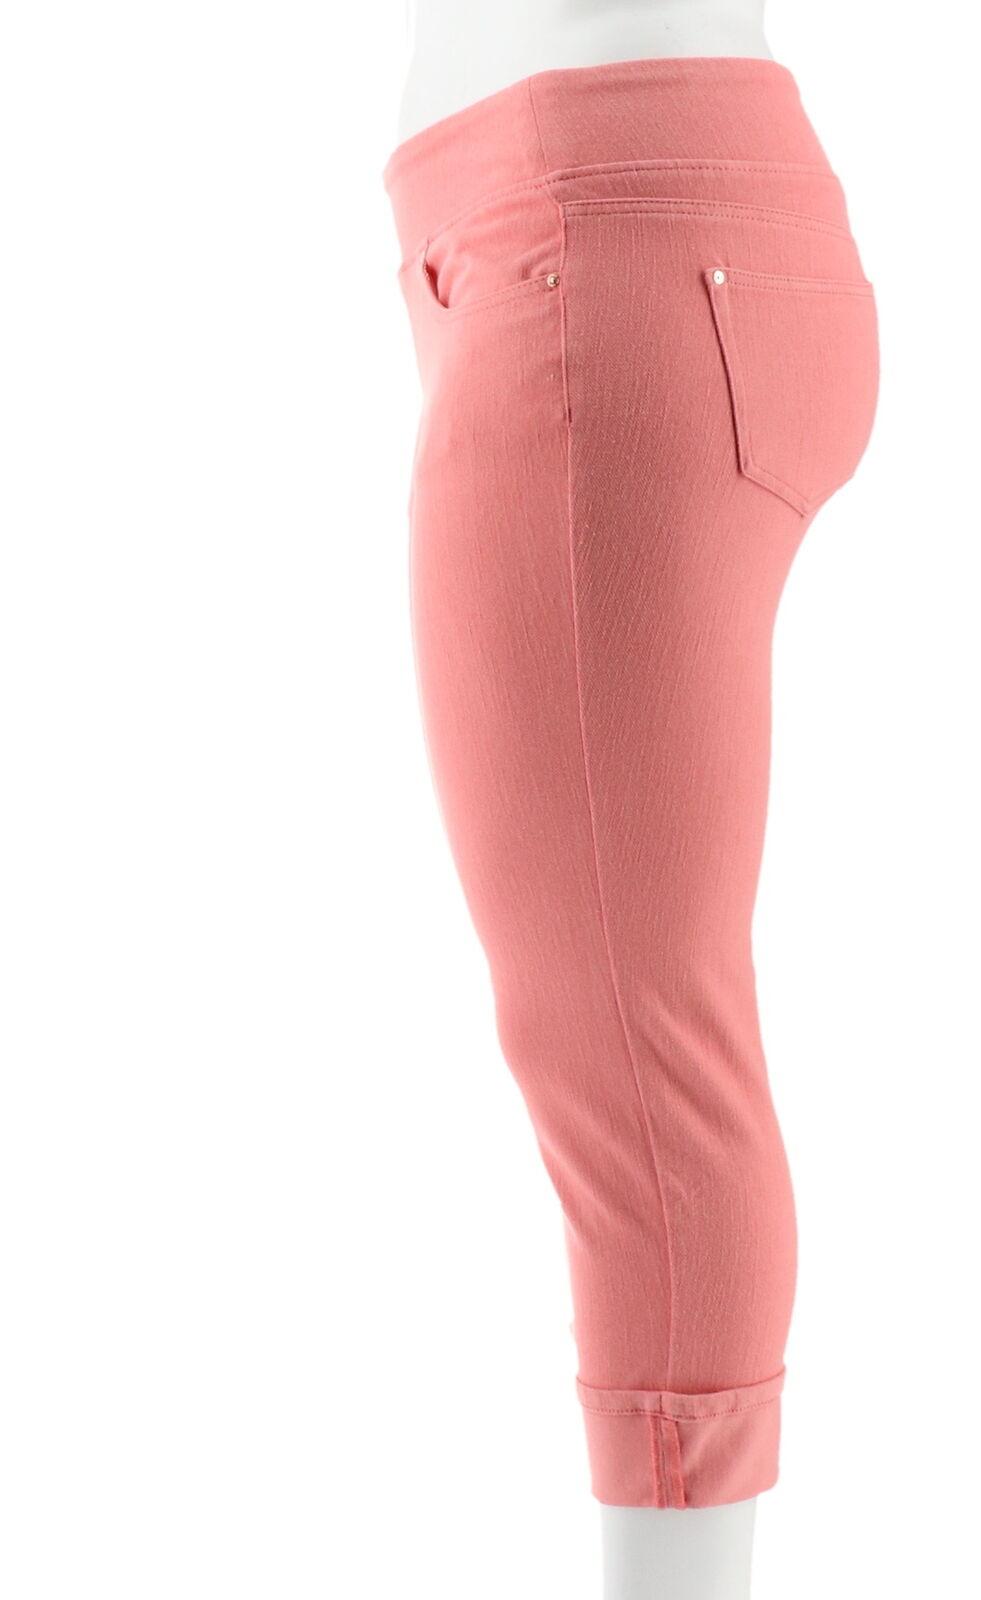 Belle Kim Gravel Flexibelle Cuffed Jeans Sunrise Pink 12 NEW A345862